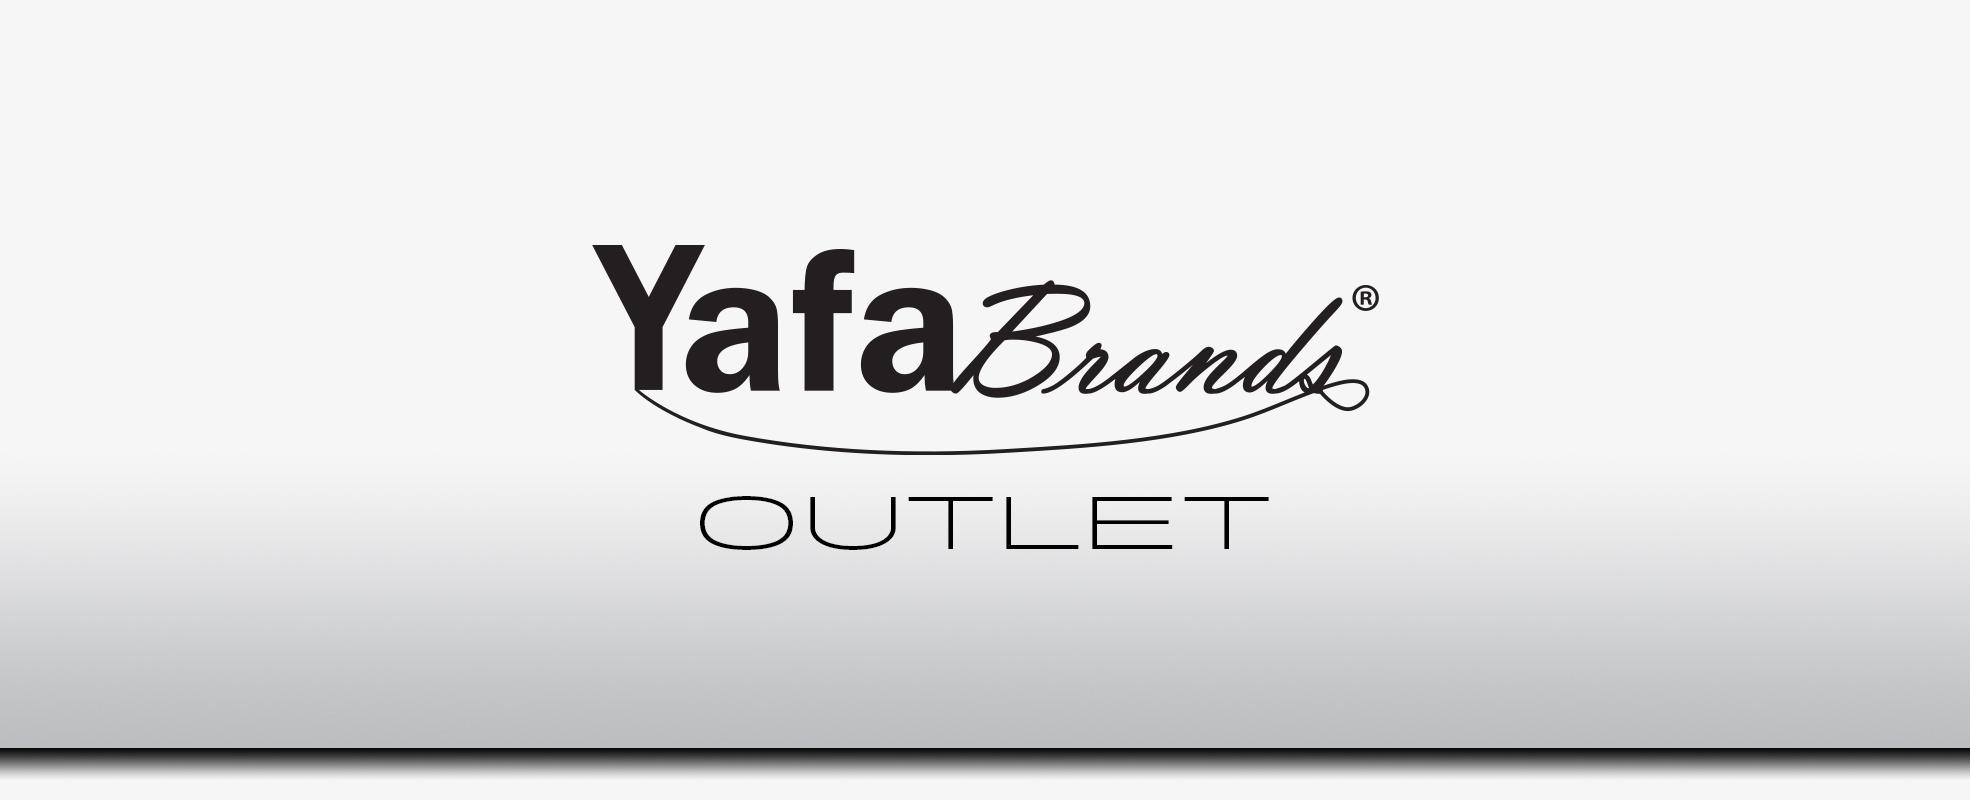 yafabrands-outlet-generic-banner-2.jpg